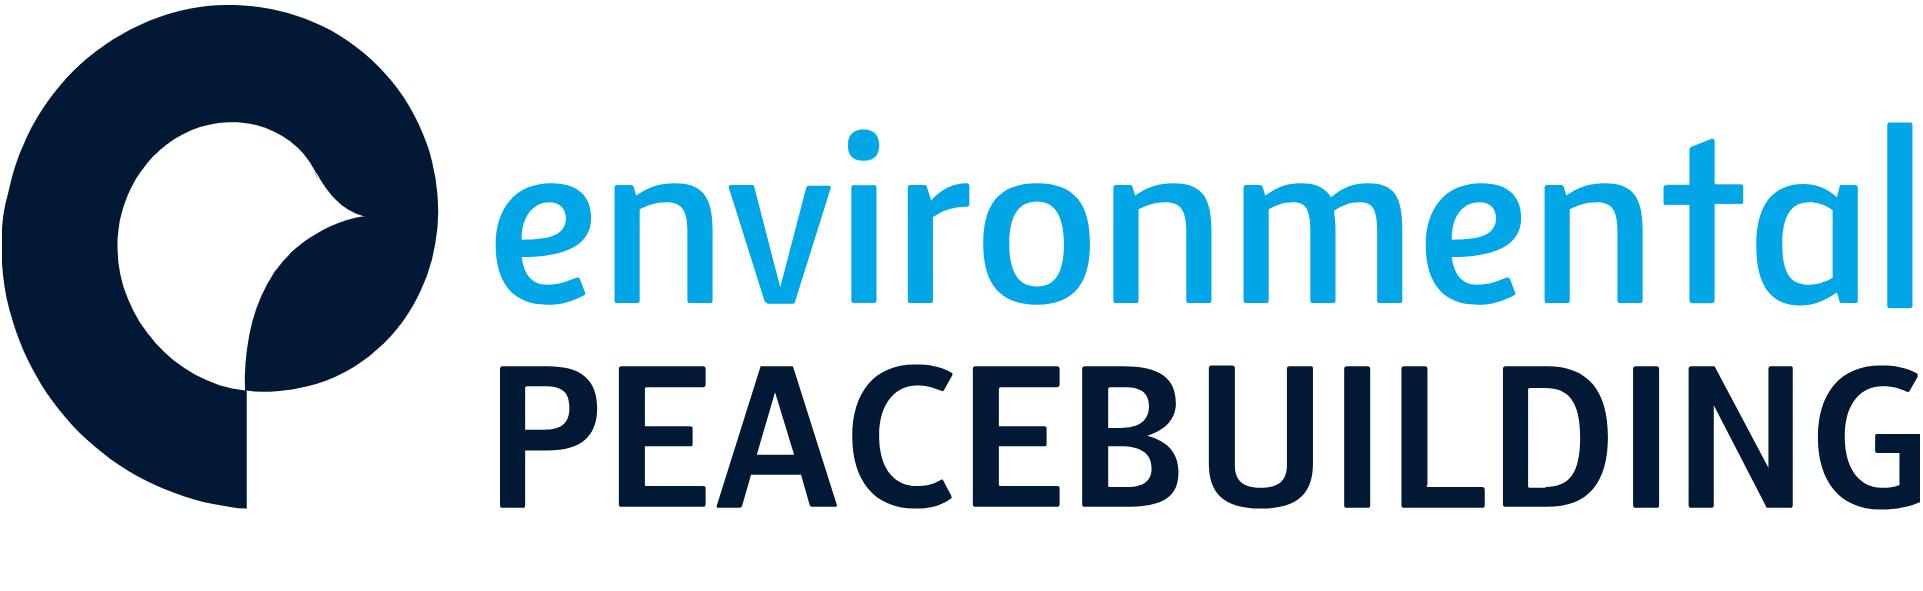 Environmental Peacebuilding logo